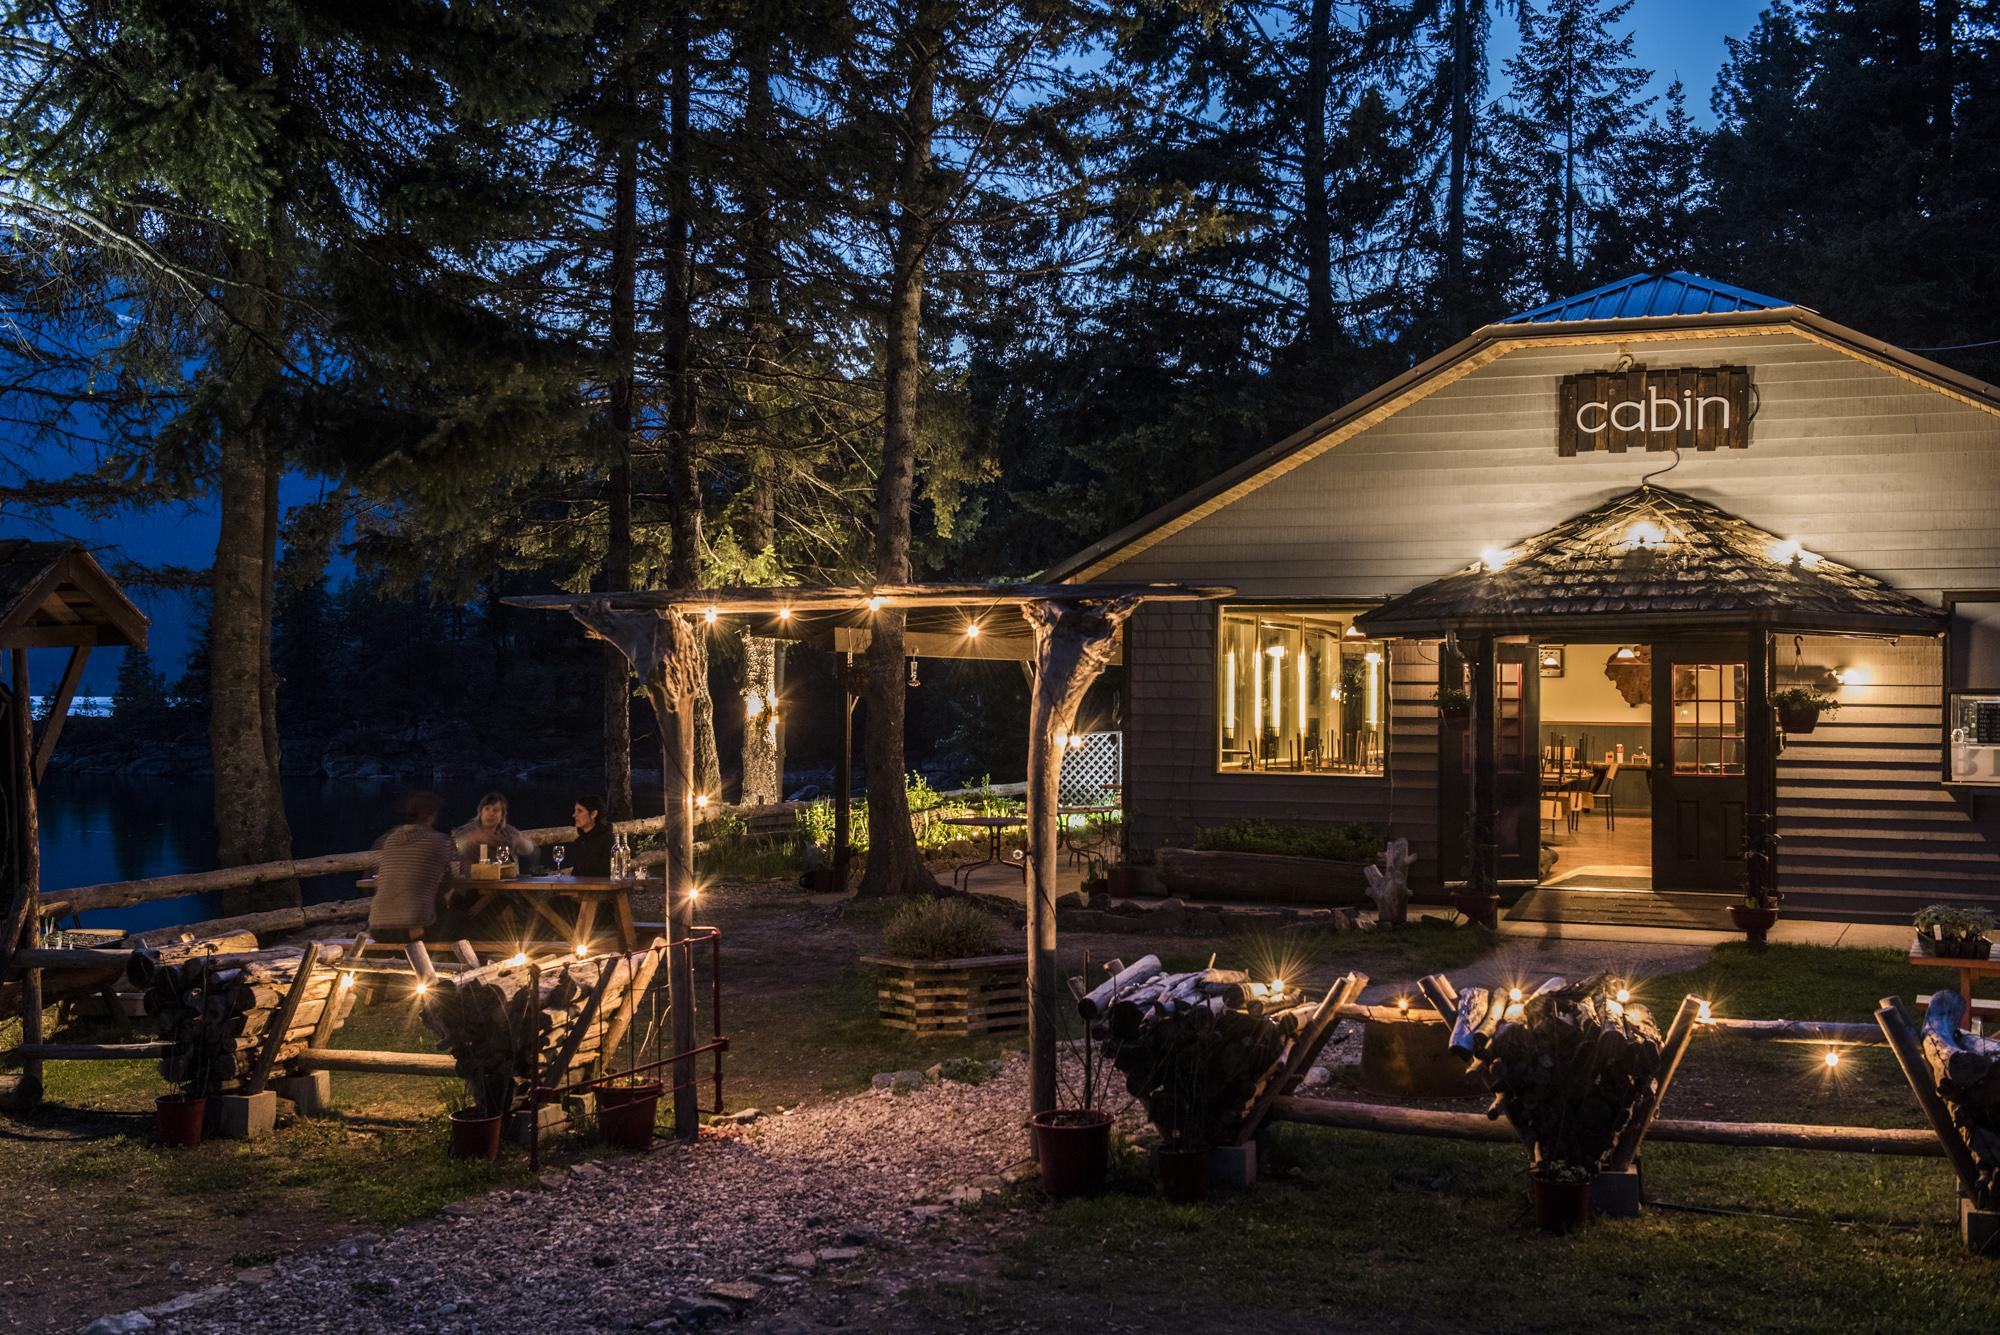 cabin-Evening.jpg